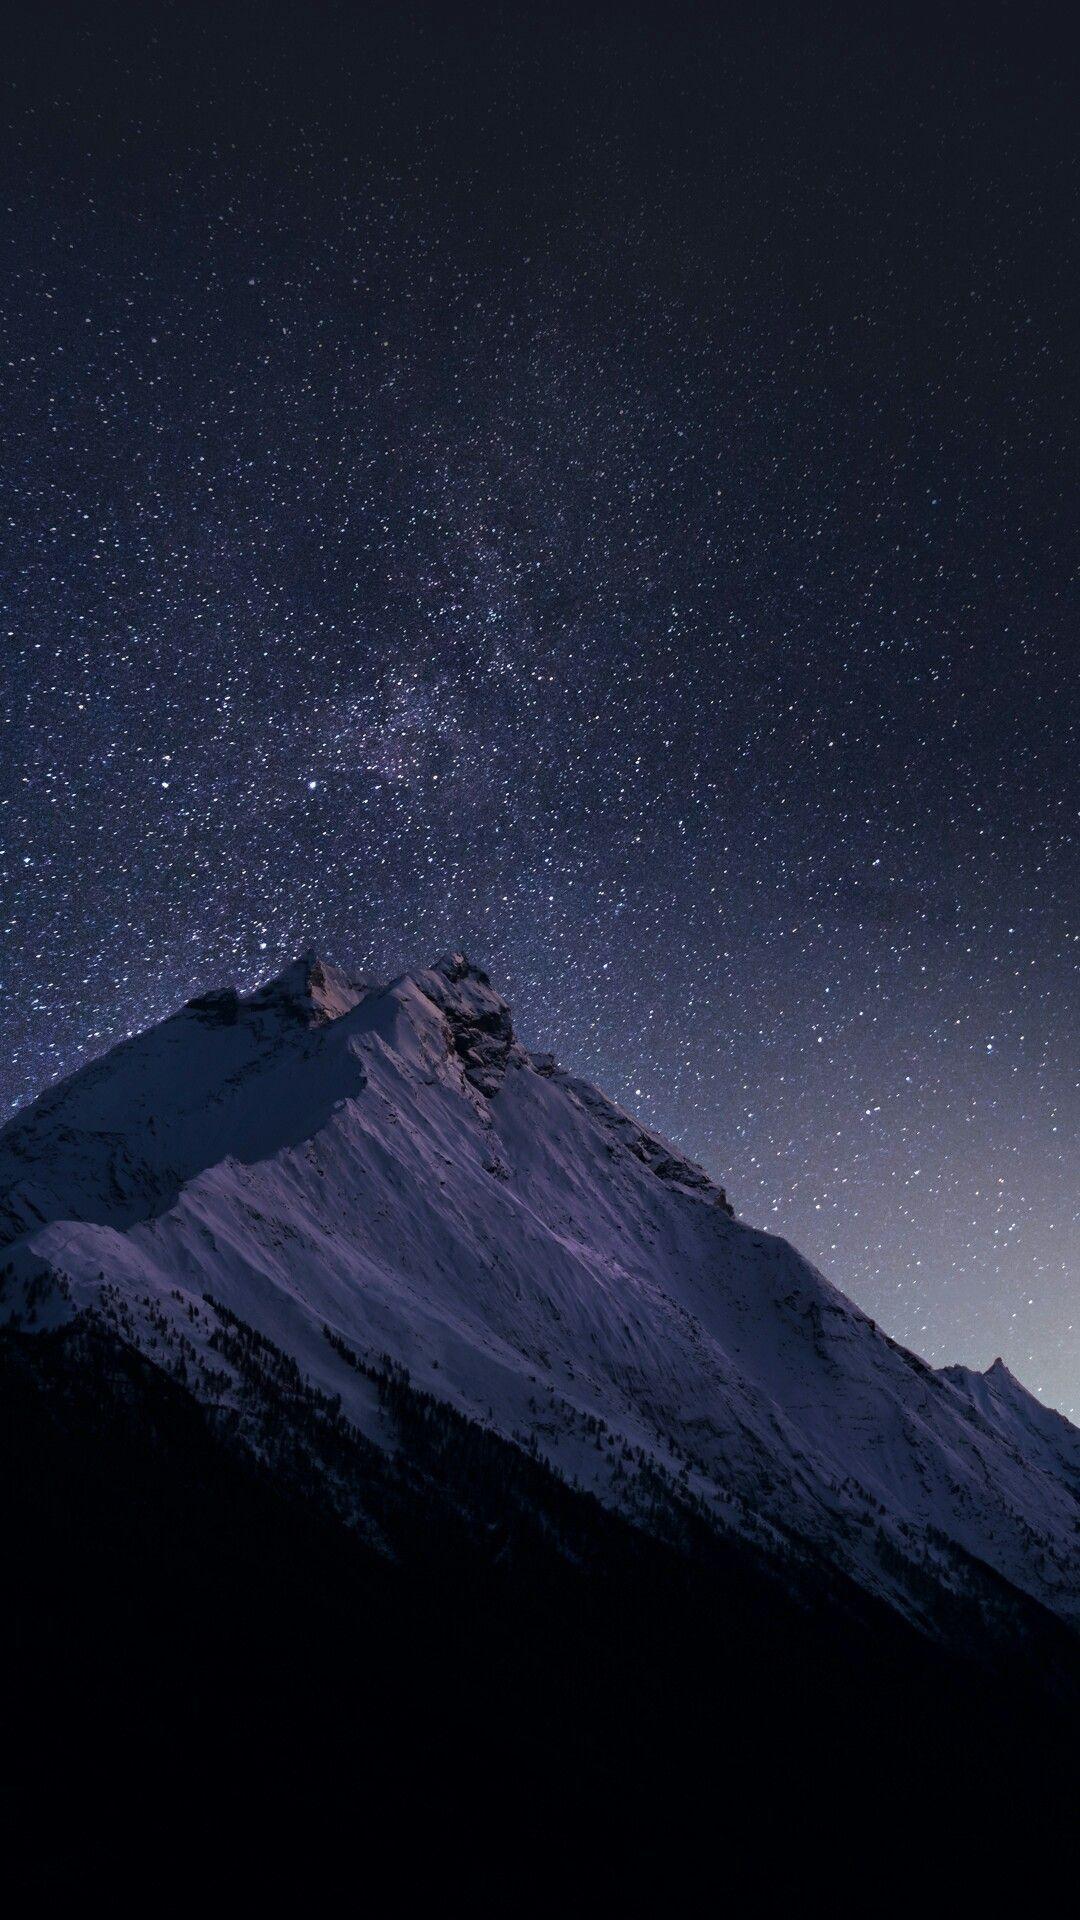 Night Mountain iPhone Wallpapers   Top Free Night Mountain iPhone ...